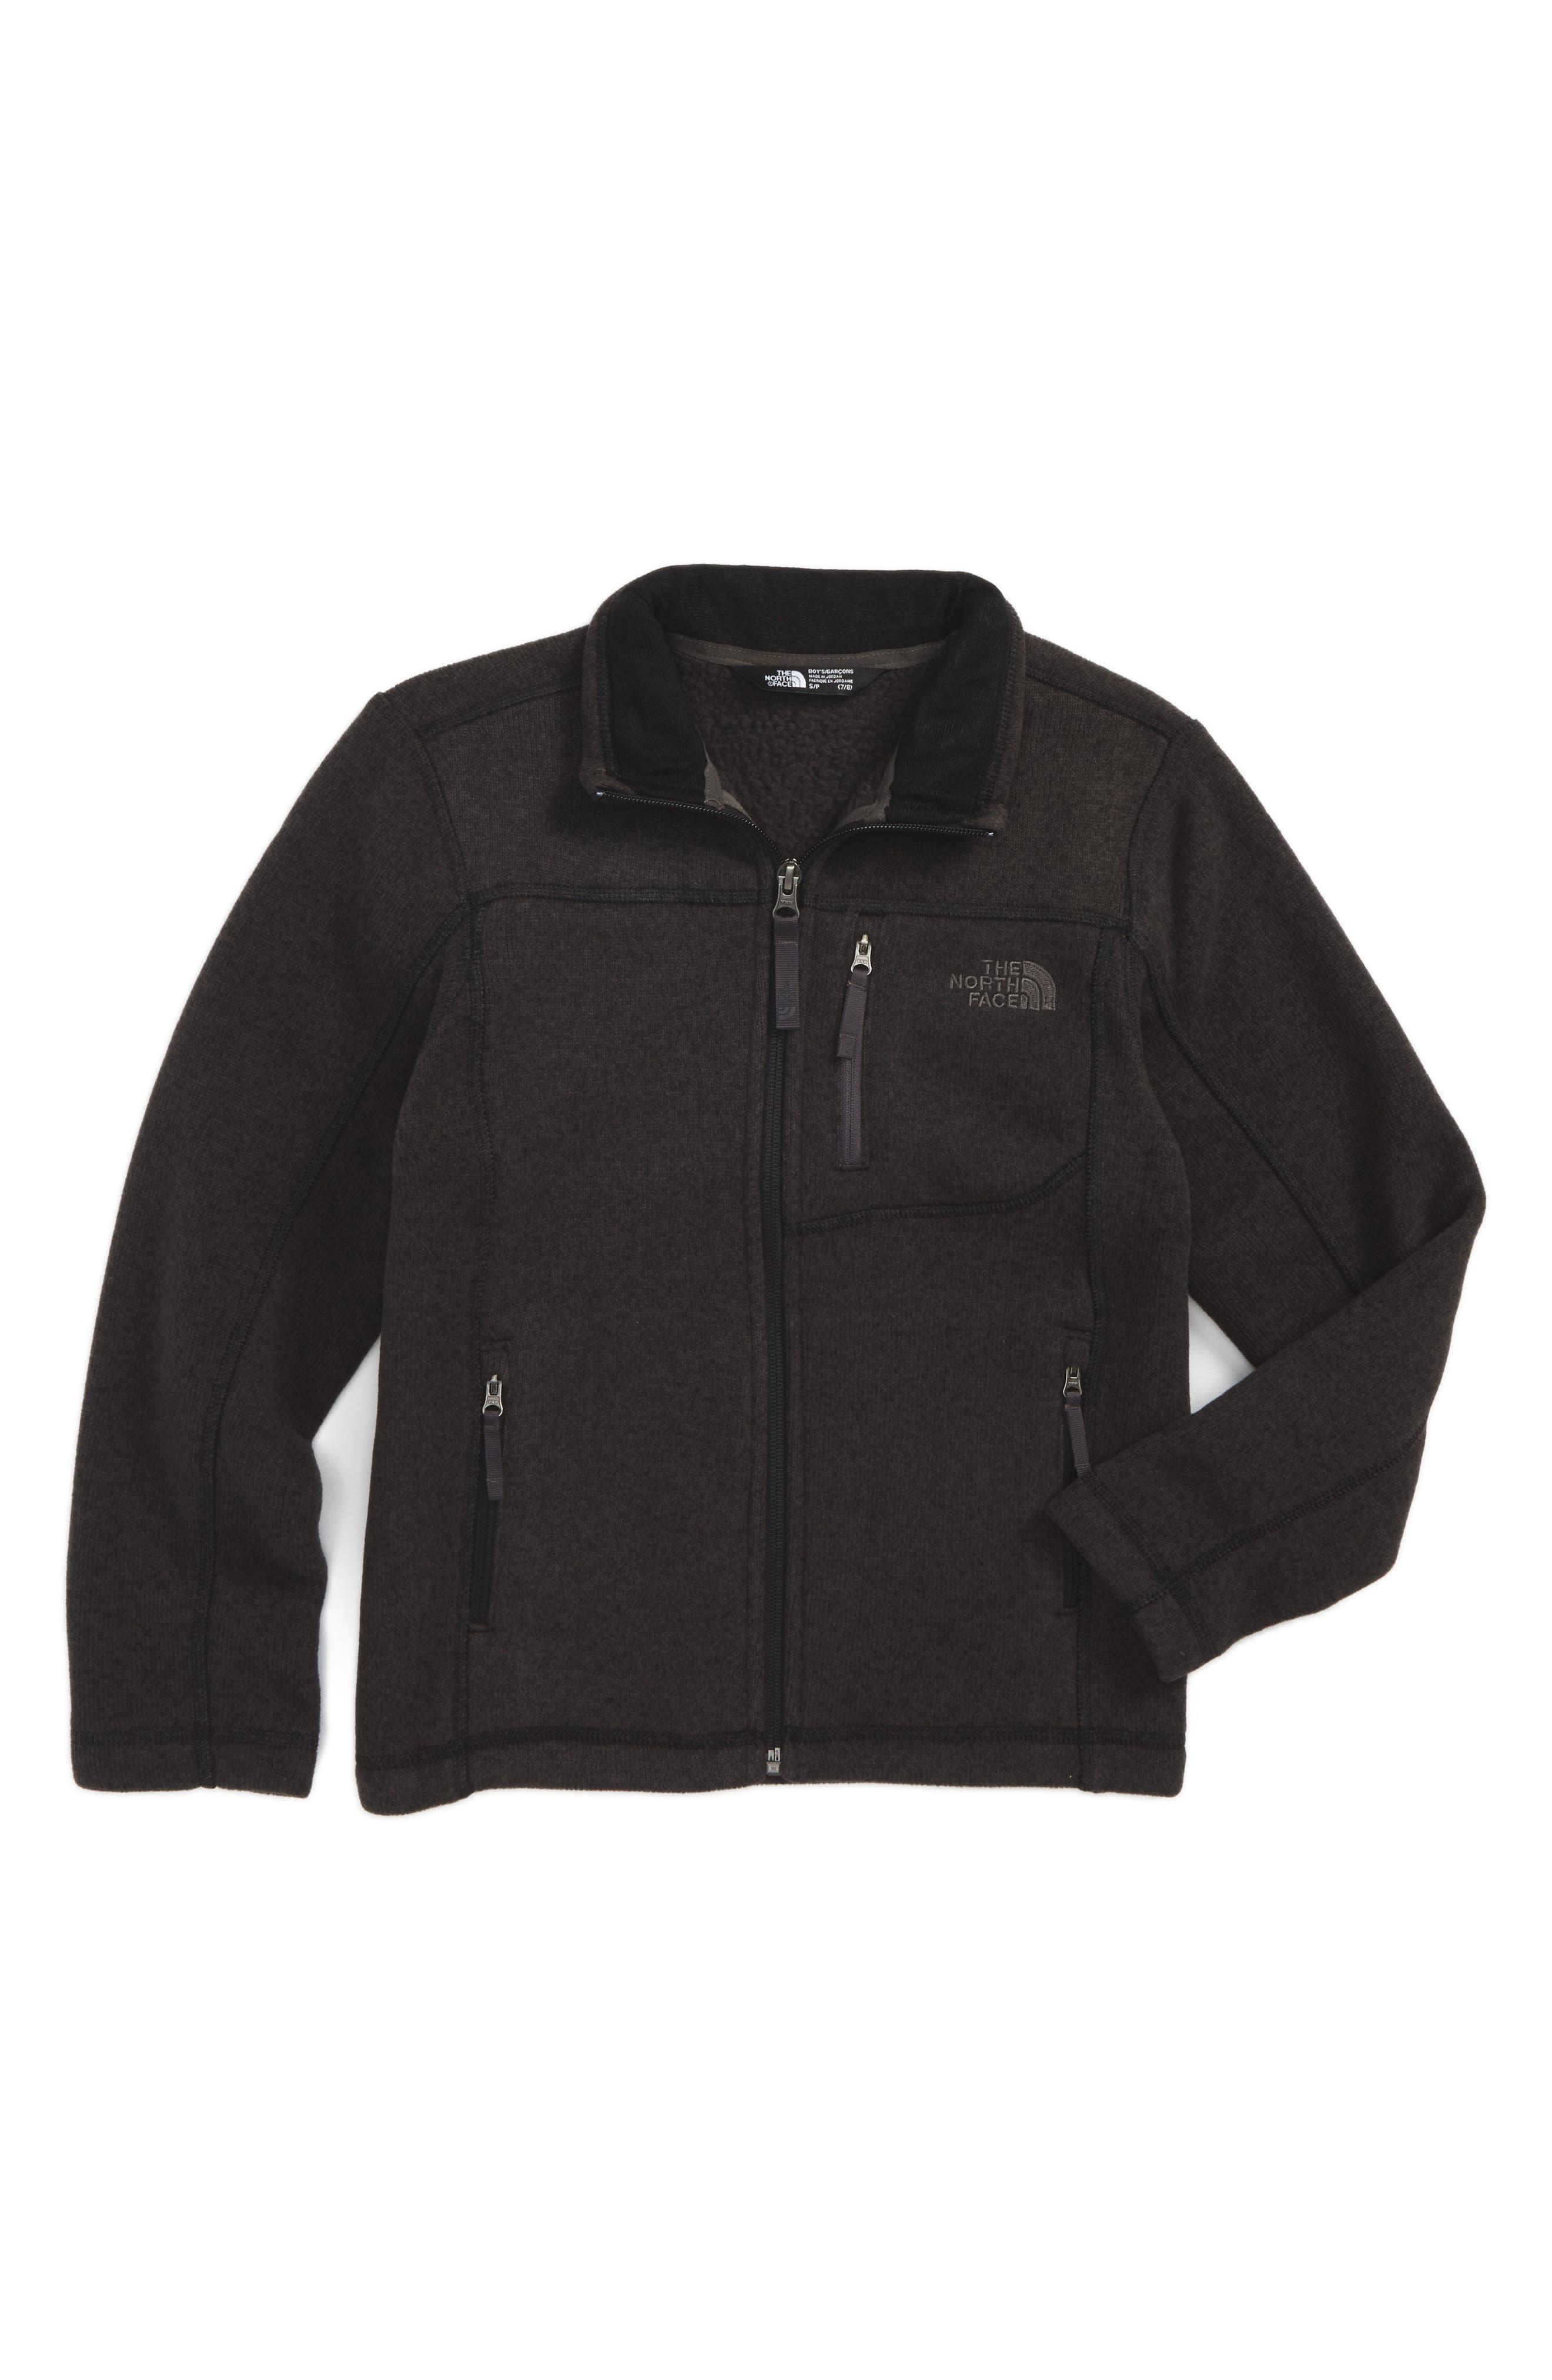 THE NORTH FACE Gordon Lyons Sweater Fleece Zip Jacket, Main, color, 025